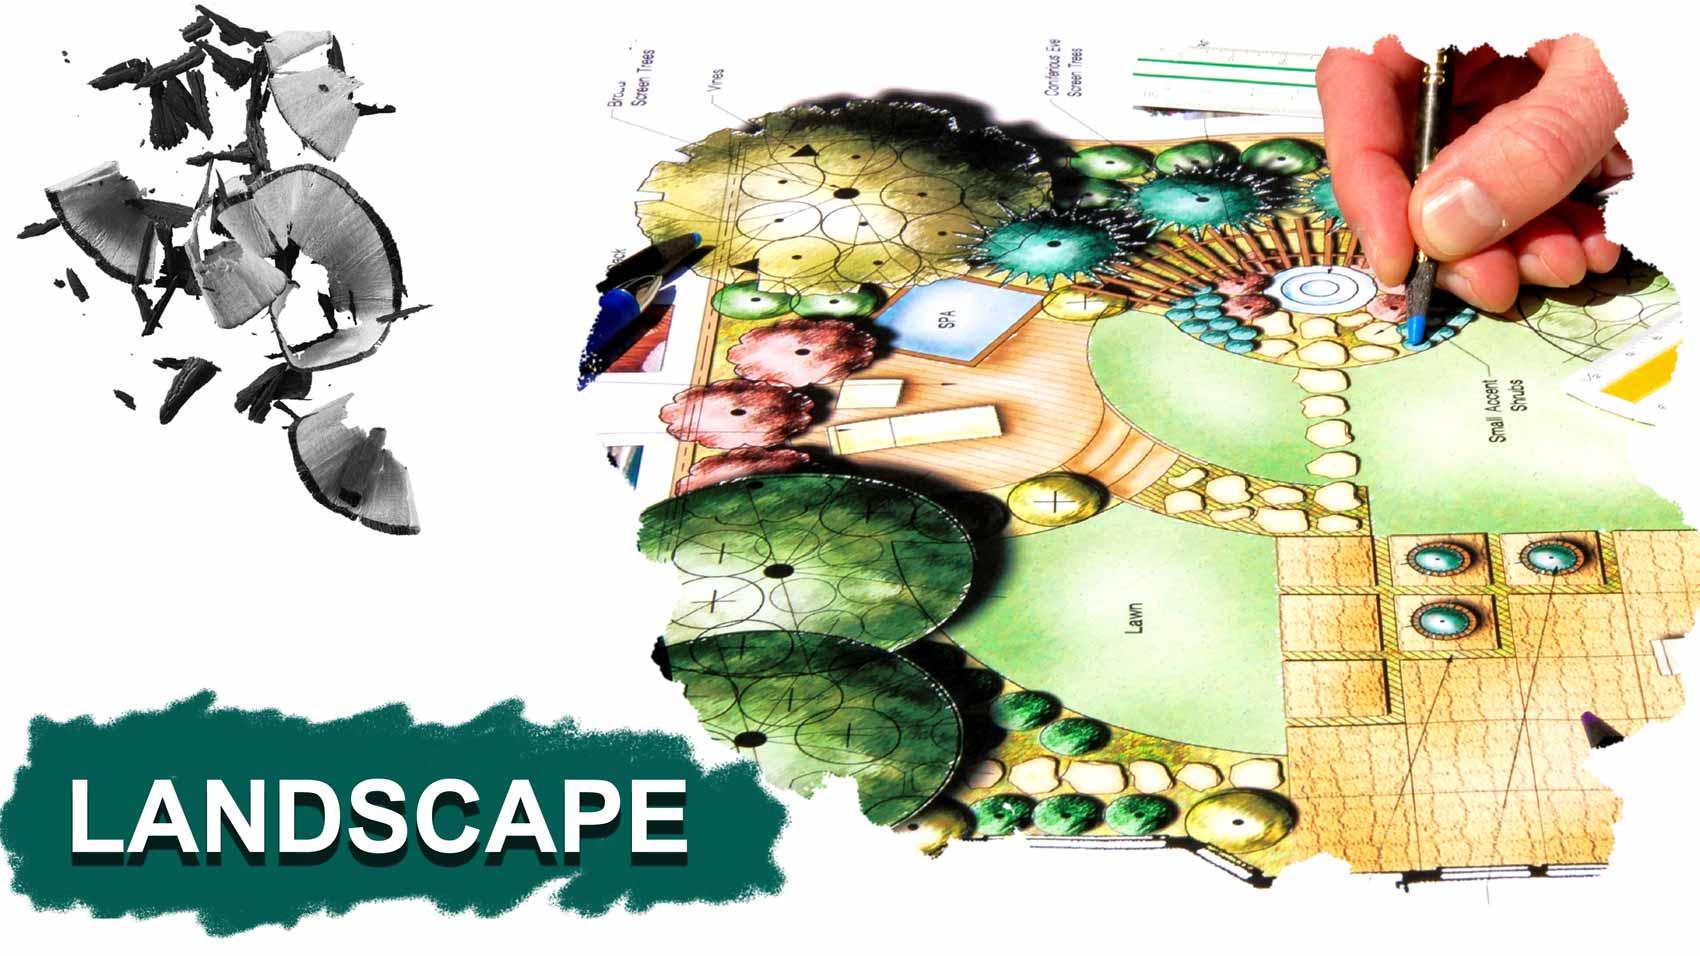 land s2 - ۱۰ نکته مهم در طراحی landscape